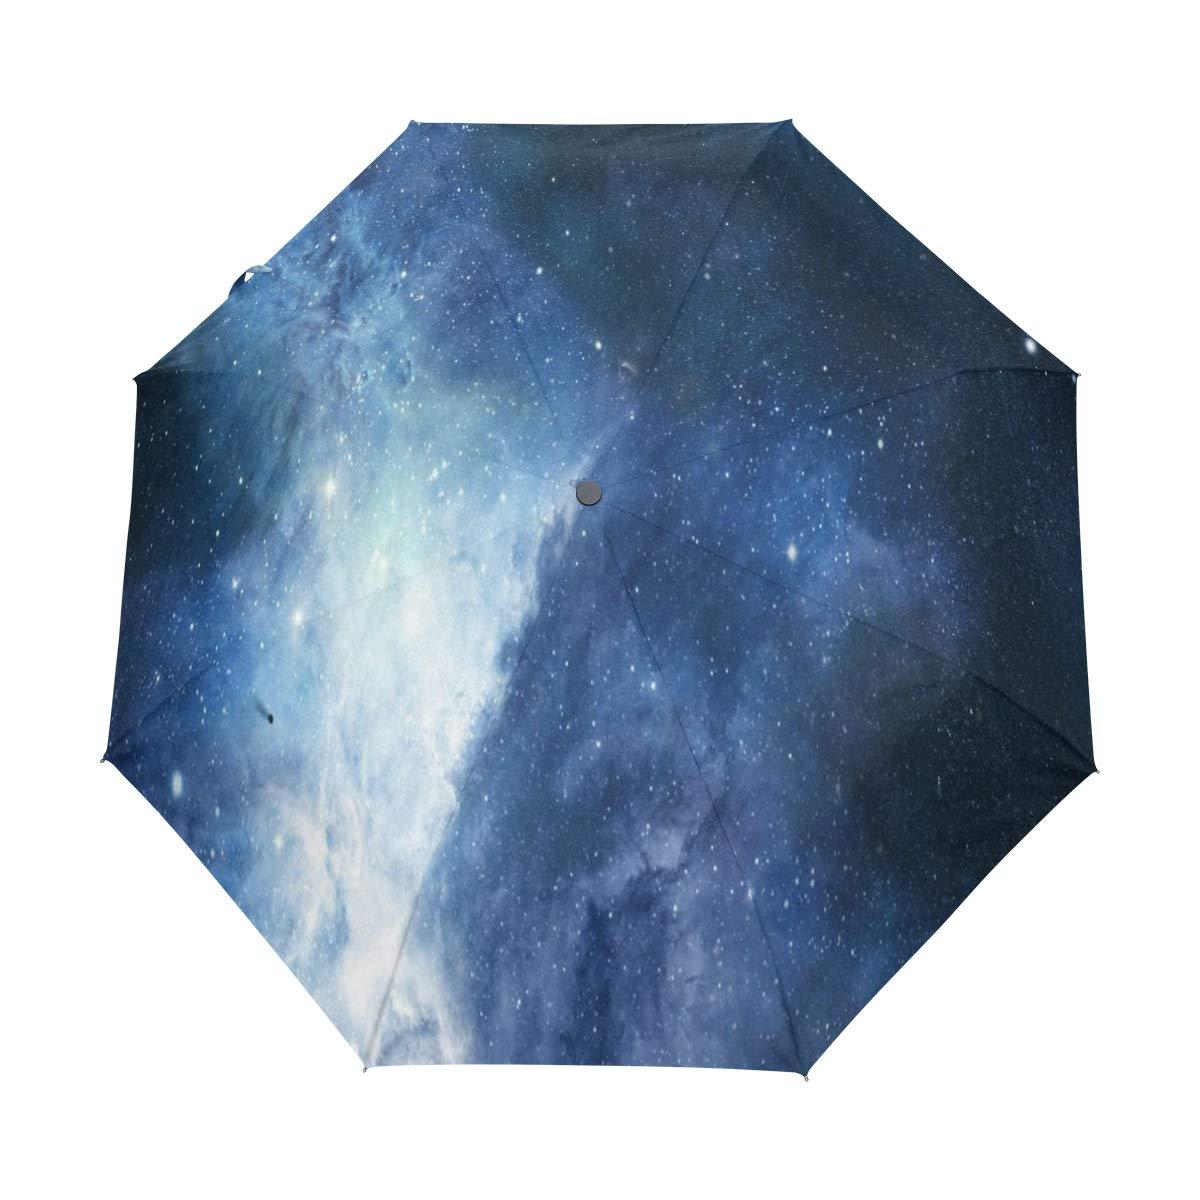 OuLian 傘 ユニコーン 星座 星 ゴルフ 旅行 太陽 雨 防風 自動傘 UV保護付き ガールズ ボーイズ キッズ B07MV9MZBM パターン2 37.8\